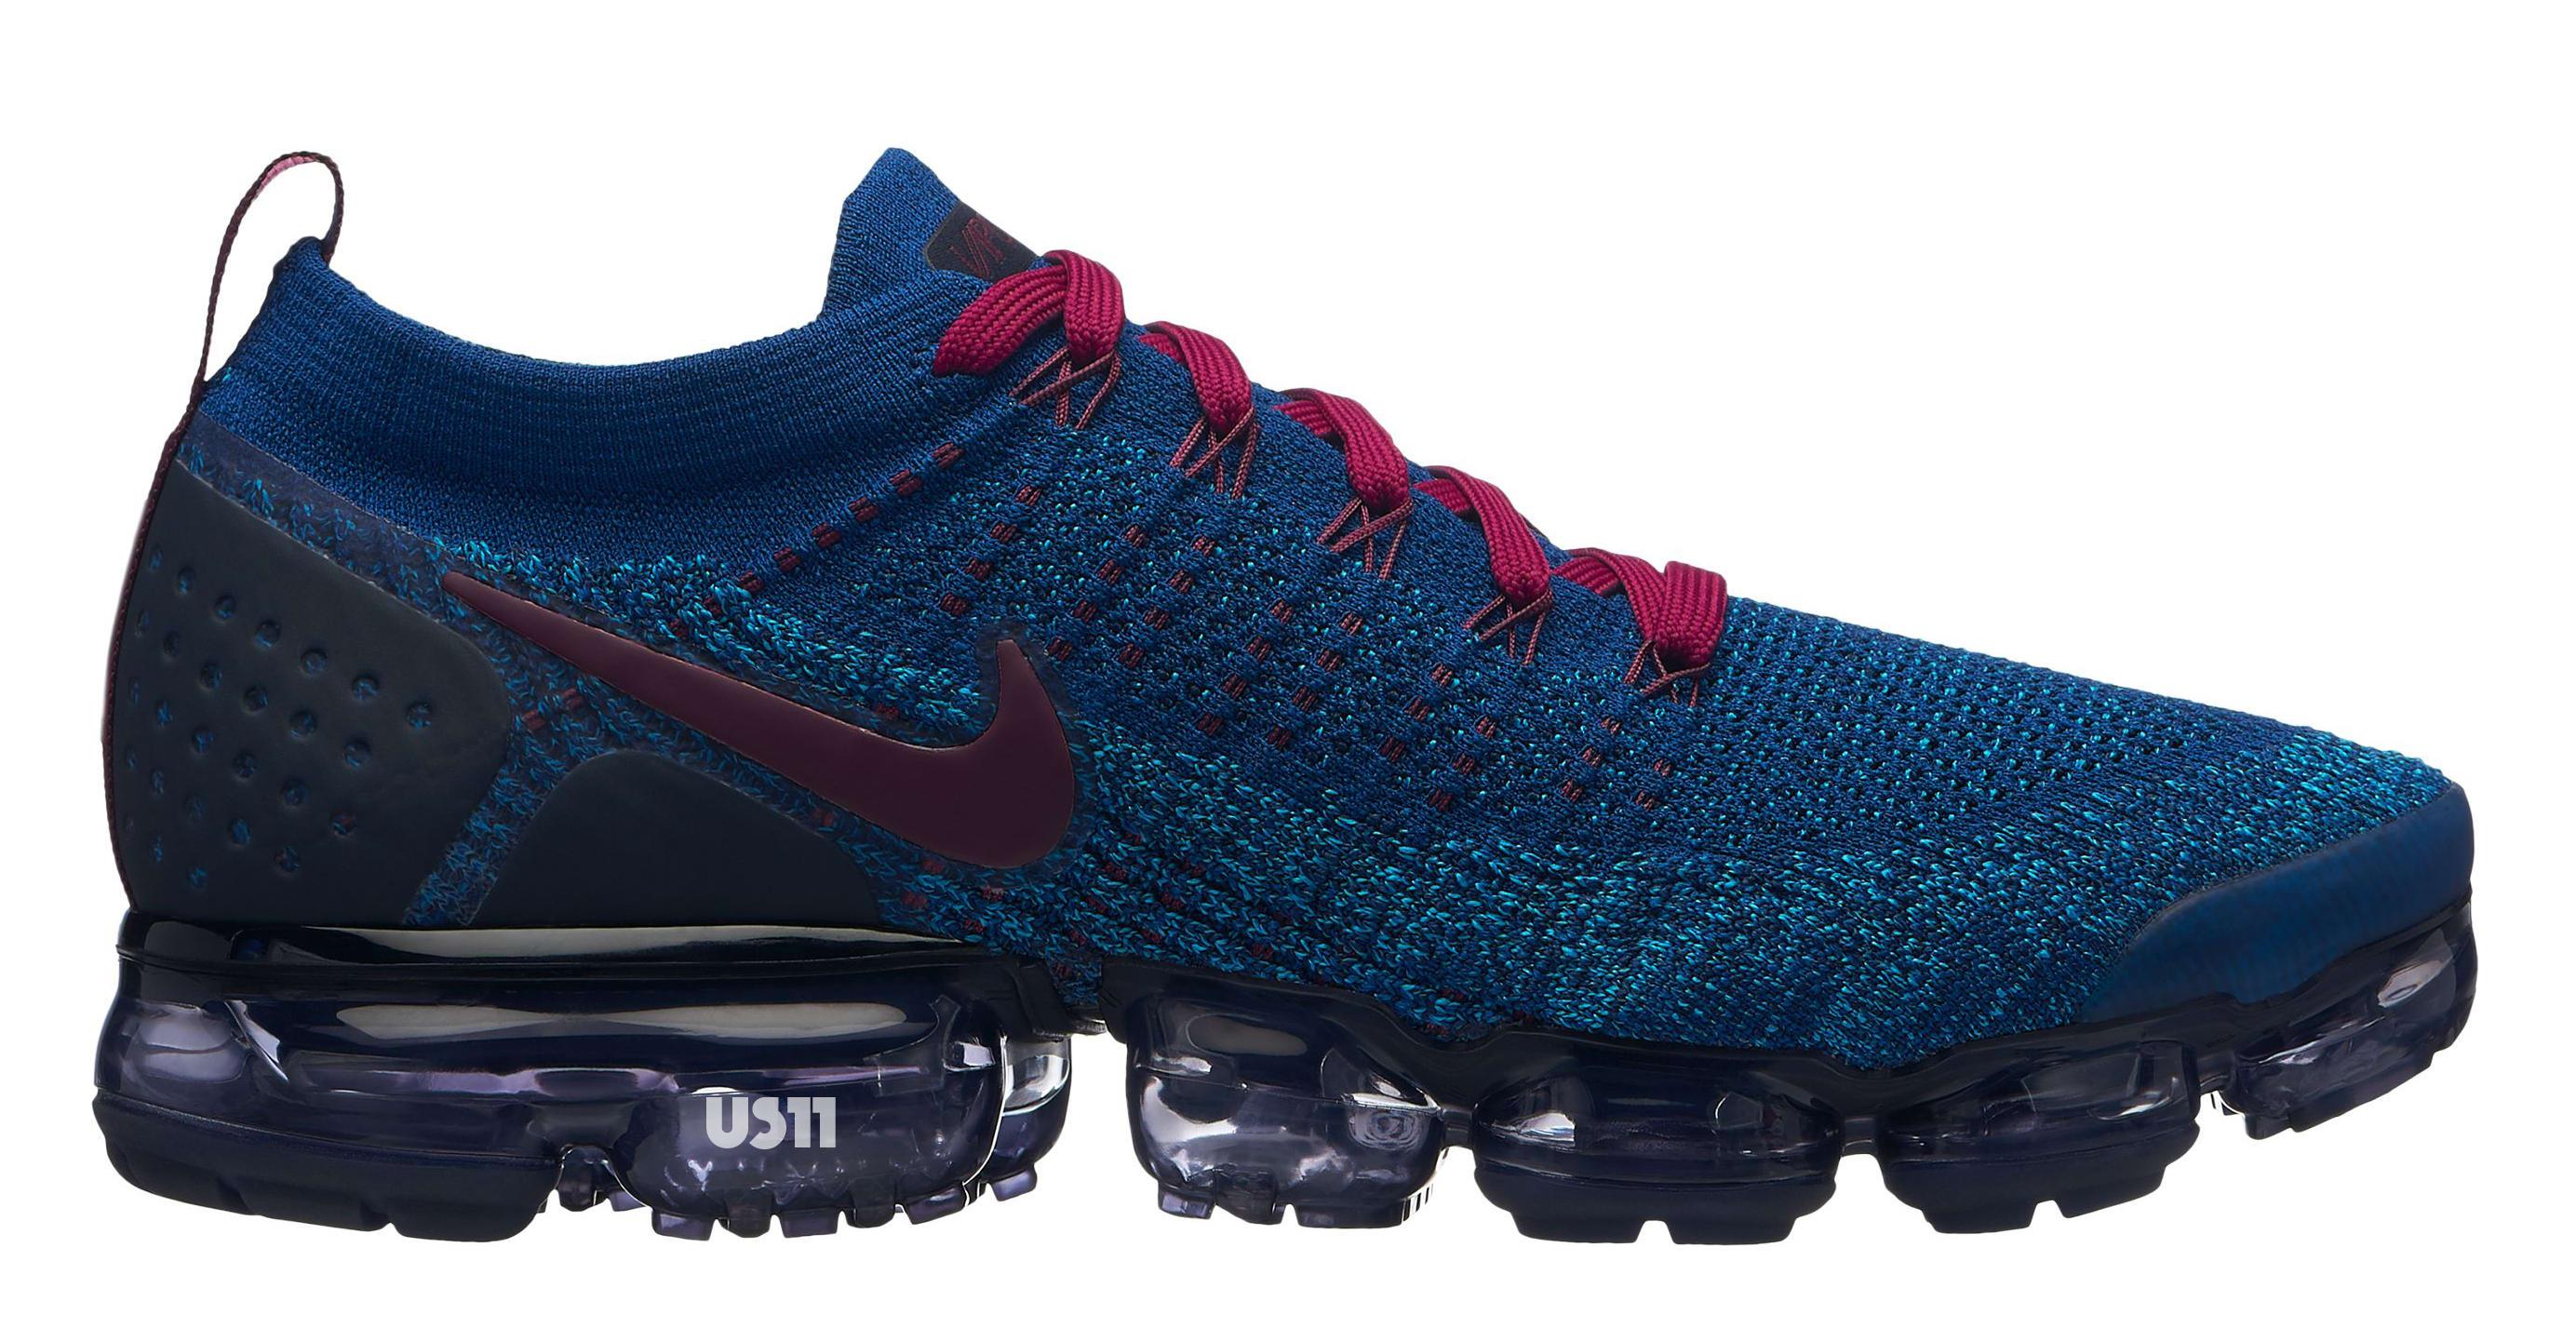 Nike VaporMax 2.0 Blue/Burgundy